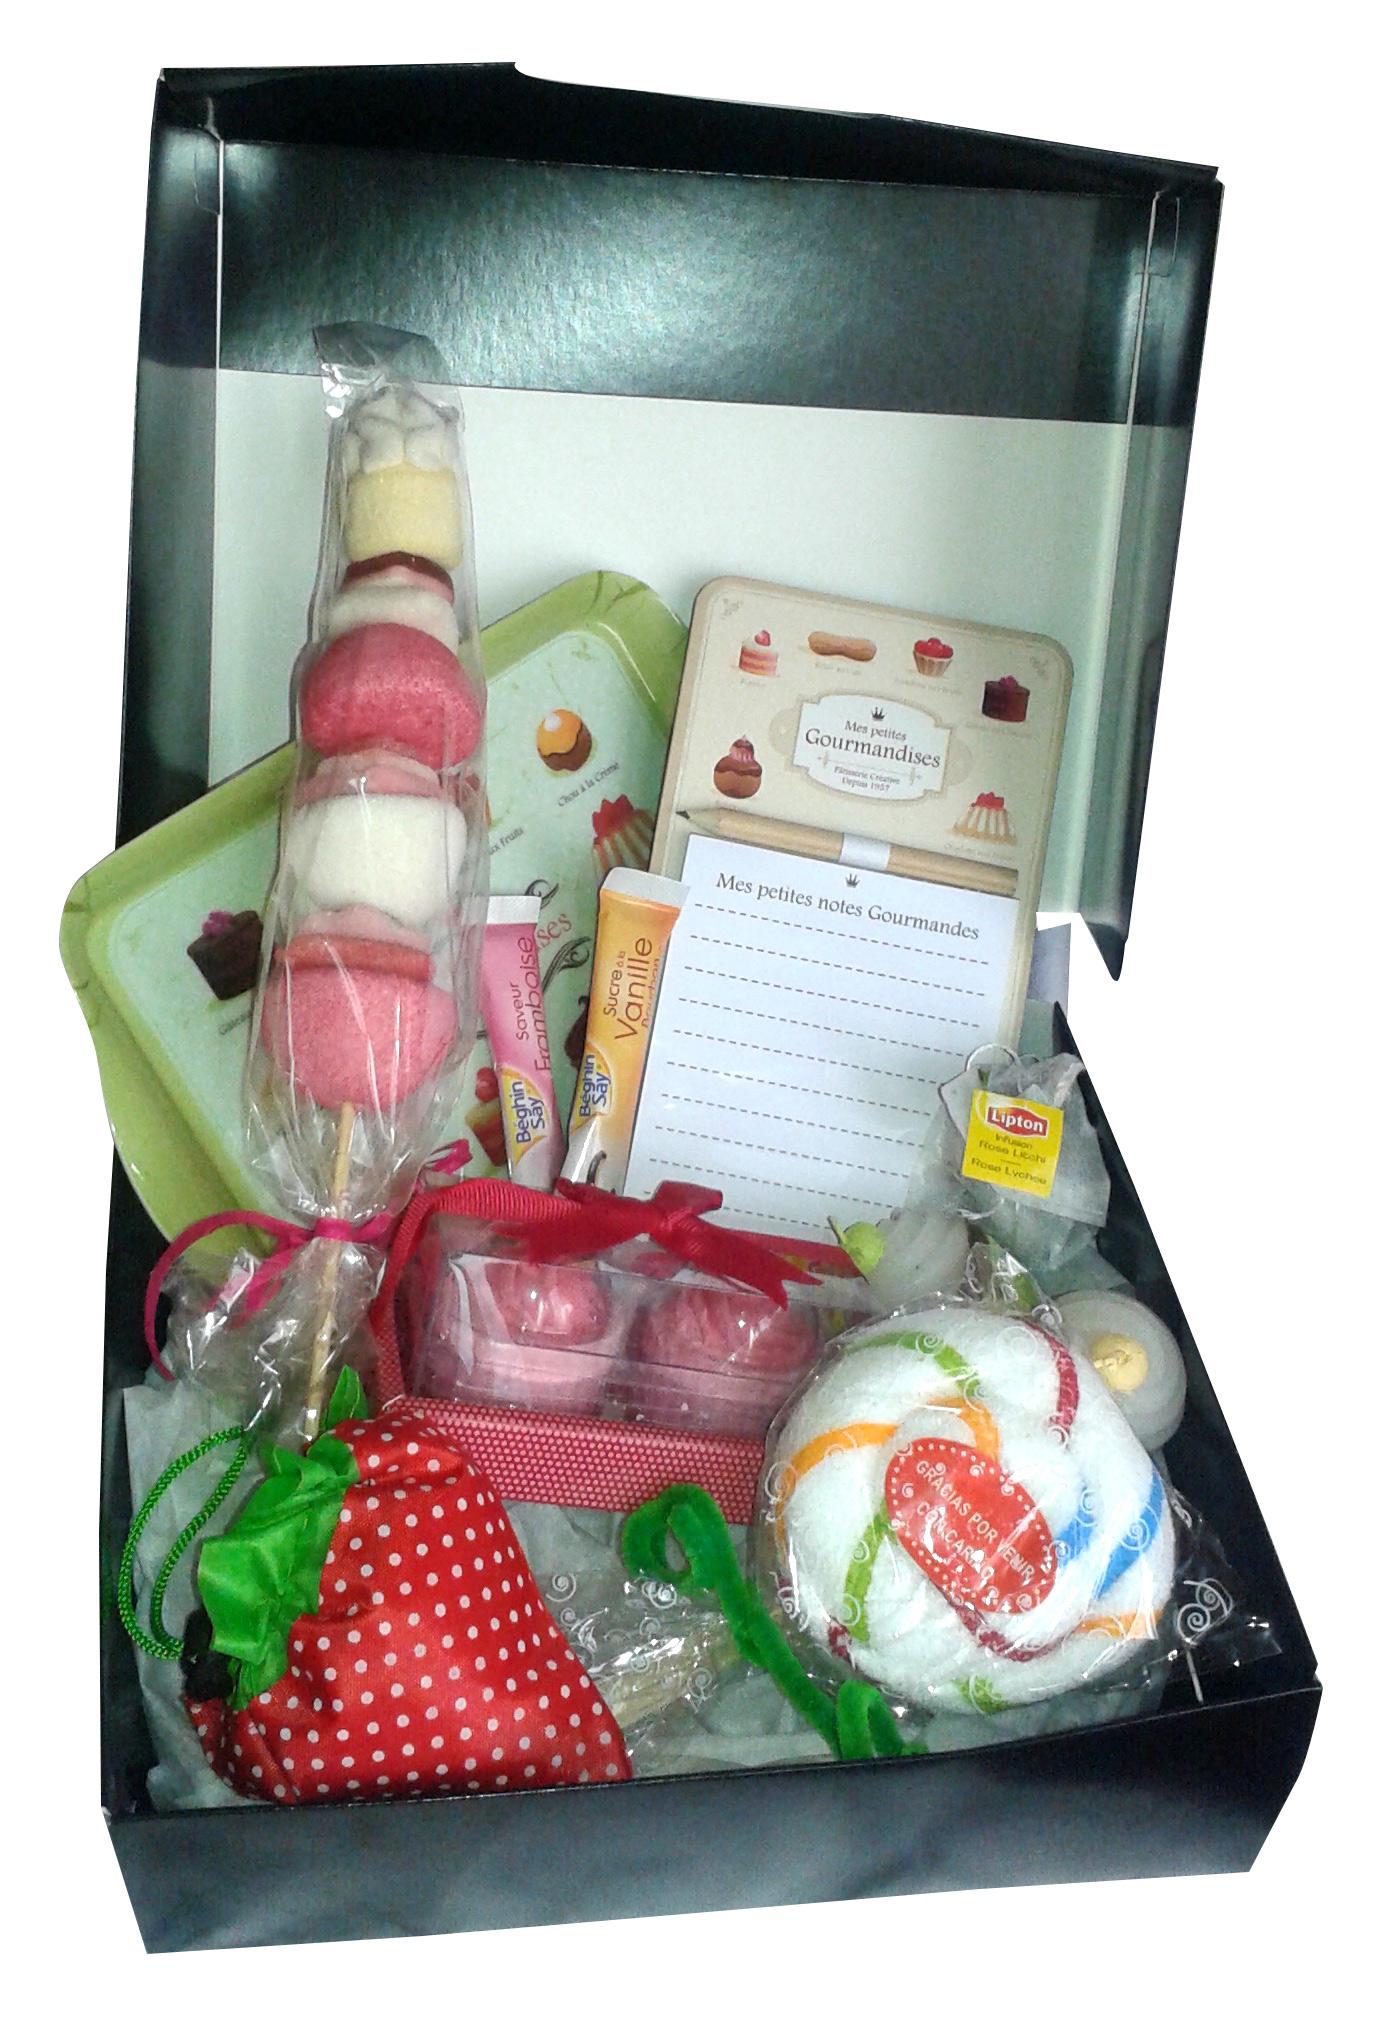 La Gourmandise Box